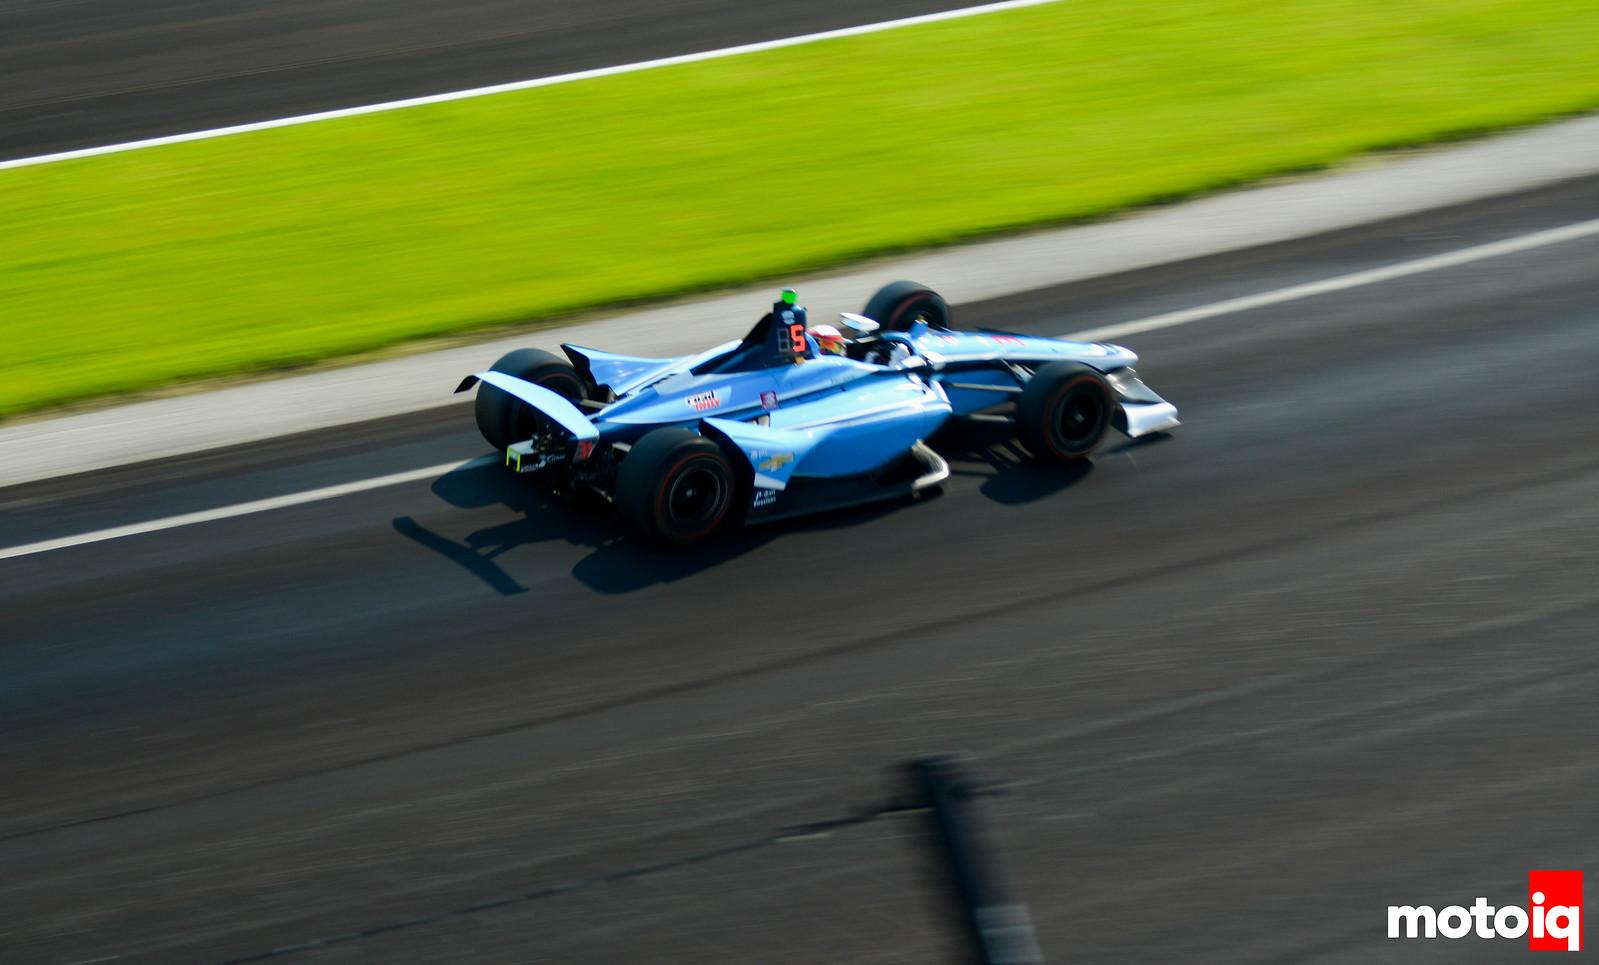 Event Coverage: 2019 Indianapolis 500 - Page 2 of 7 - MotoIQ